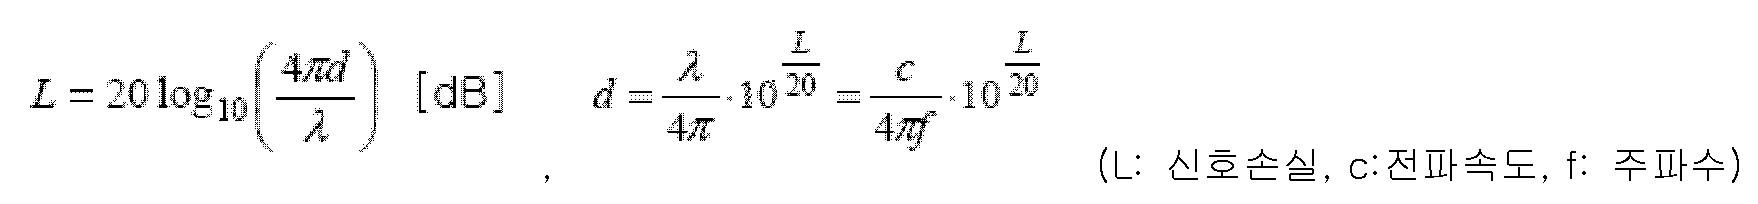 Figure 112007062753914-pat00001